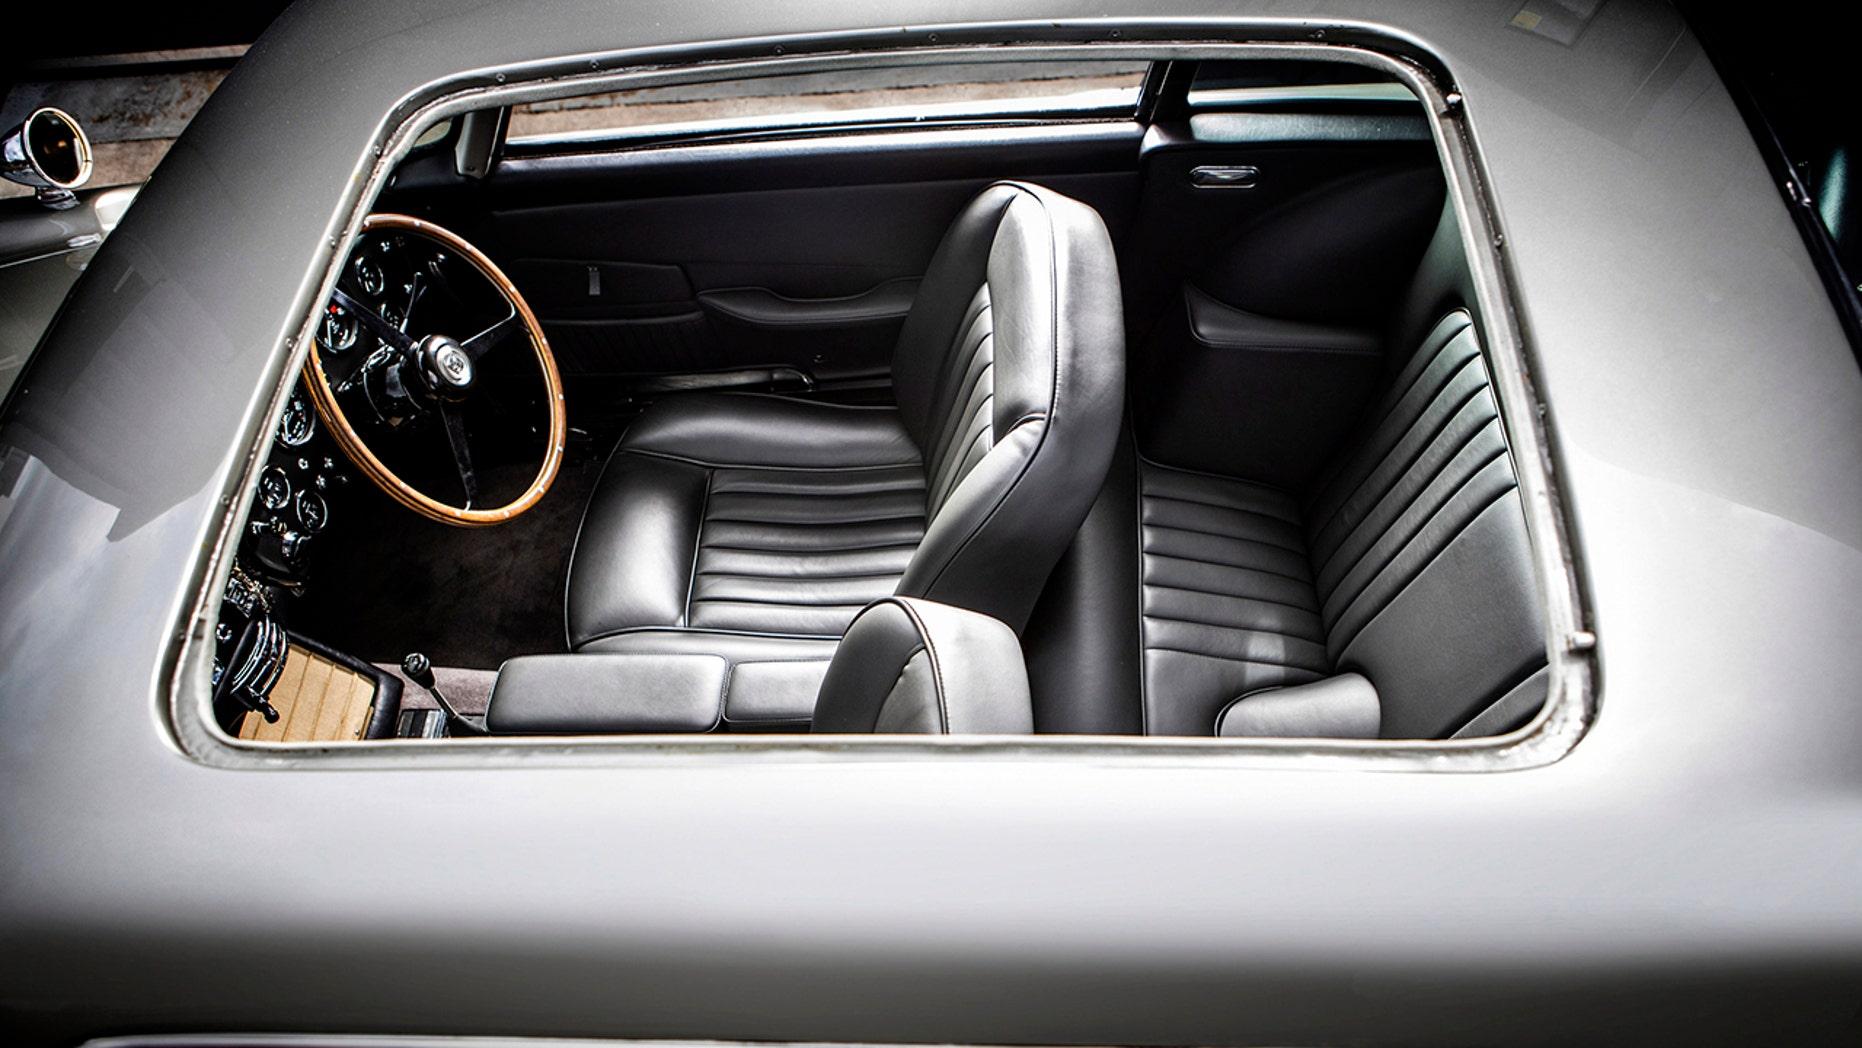 James Bond 007 Aston Martin DB5 interior